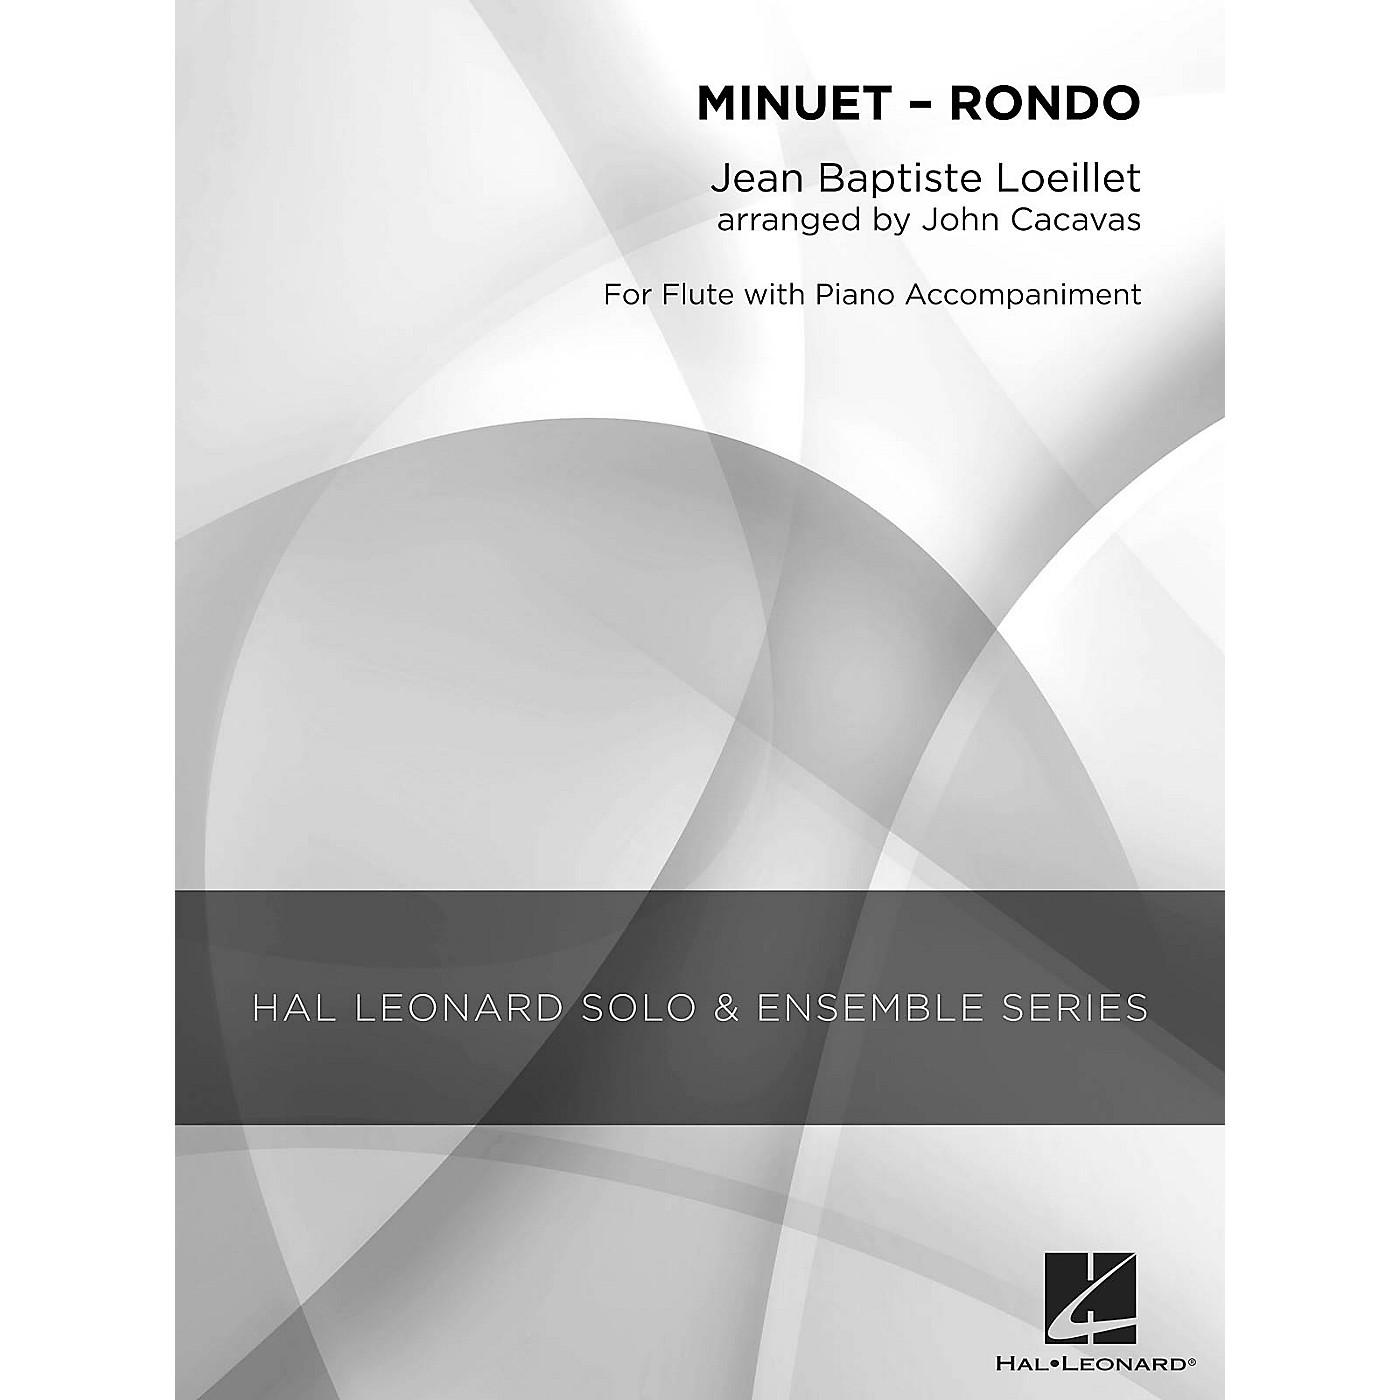 Hal Leonard Minuet - Rondo (Grade 2.5 Flute Solo) Concert Band Level 2.5 Arranged by John Cacavas thumbnail